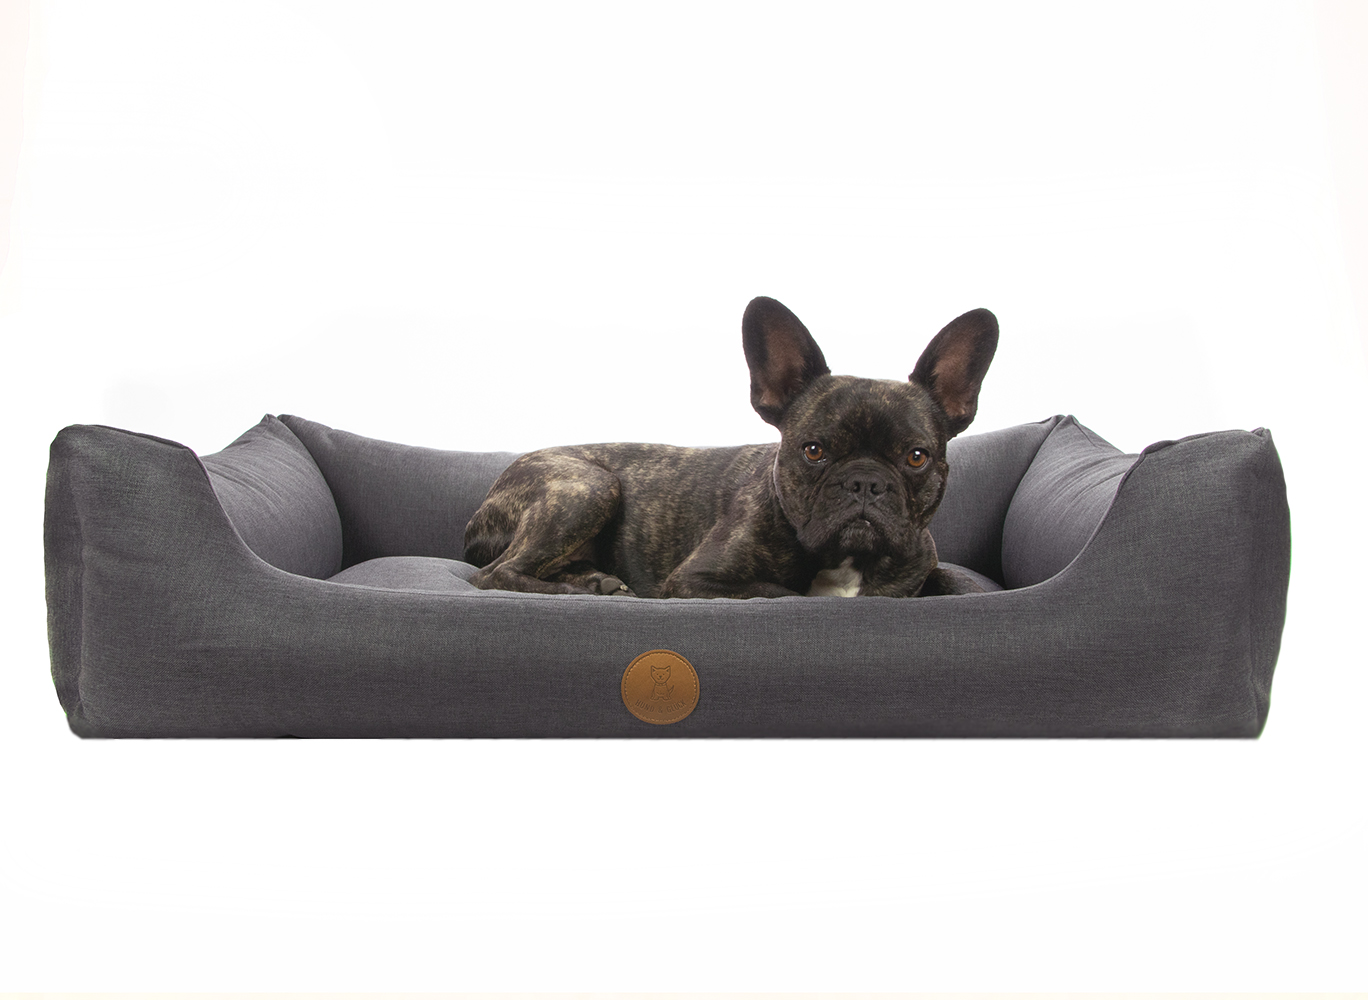 Hund&Glück Hundebett Dreamy Anthrazit XL